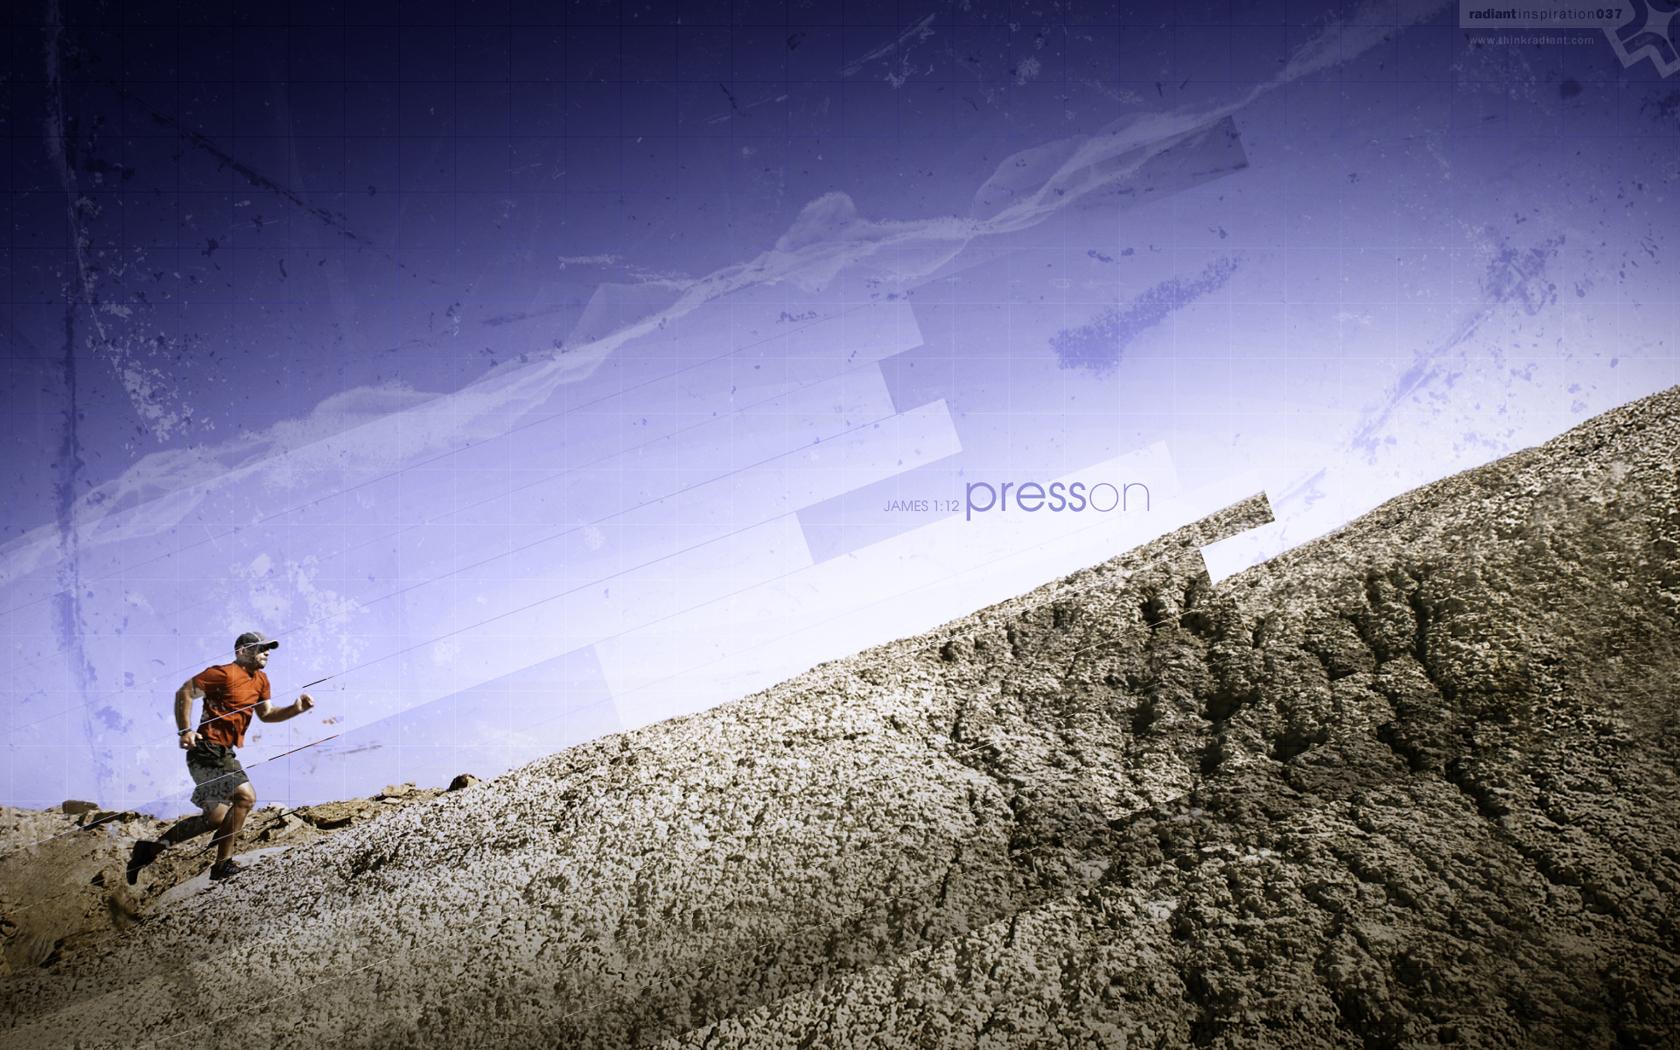 Press On.jpg